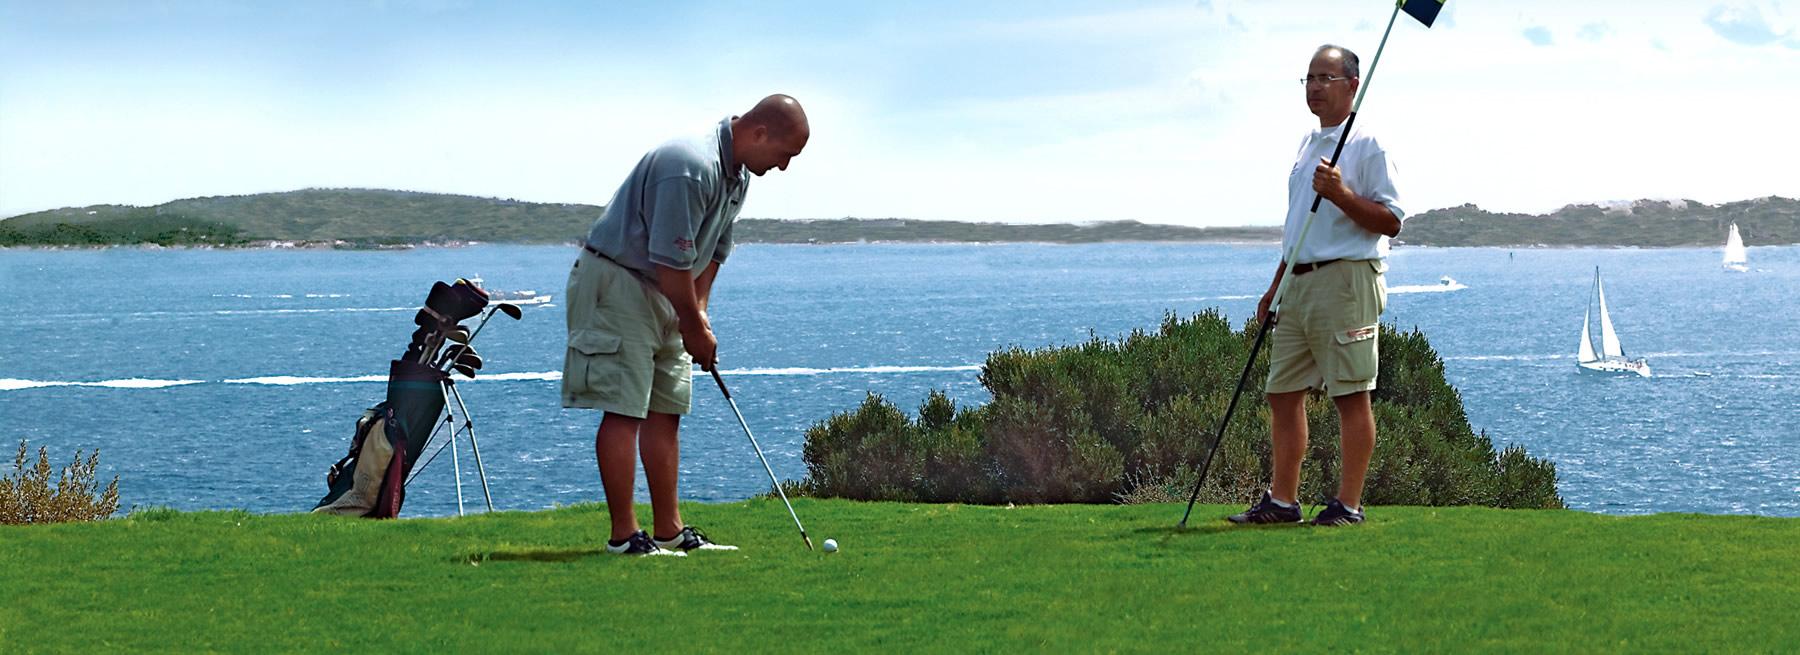 hotel-valle-dell-erica_slider_sport-golf-pitch-putt-santa-teresa-gallura1